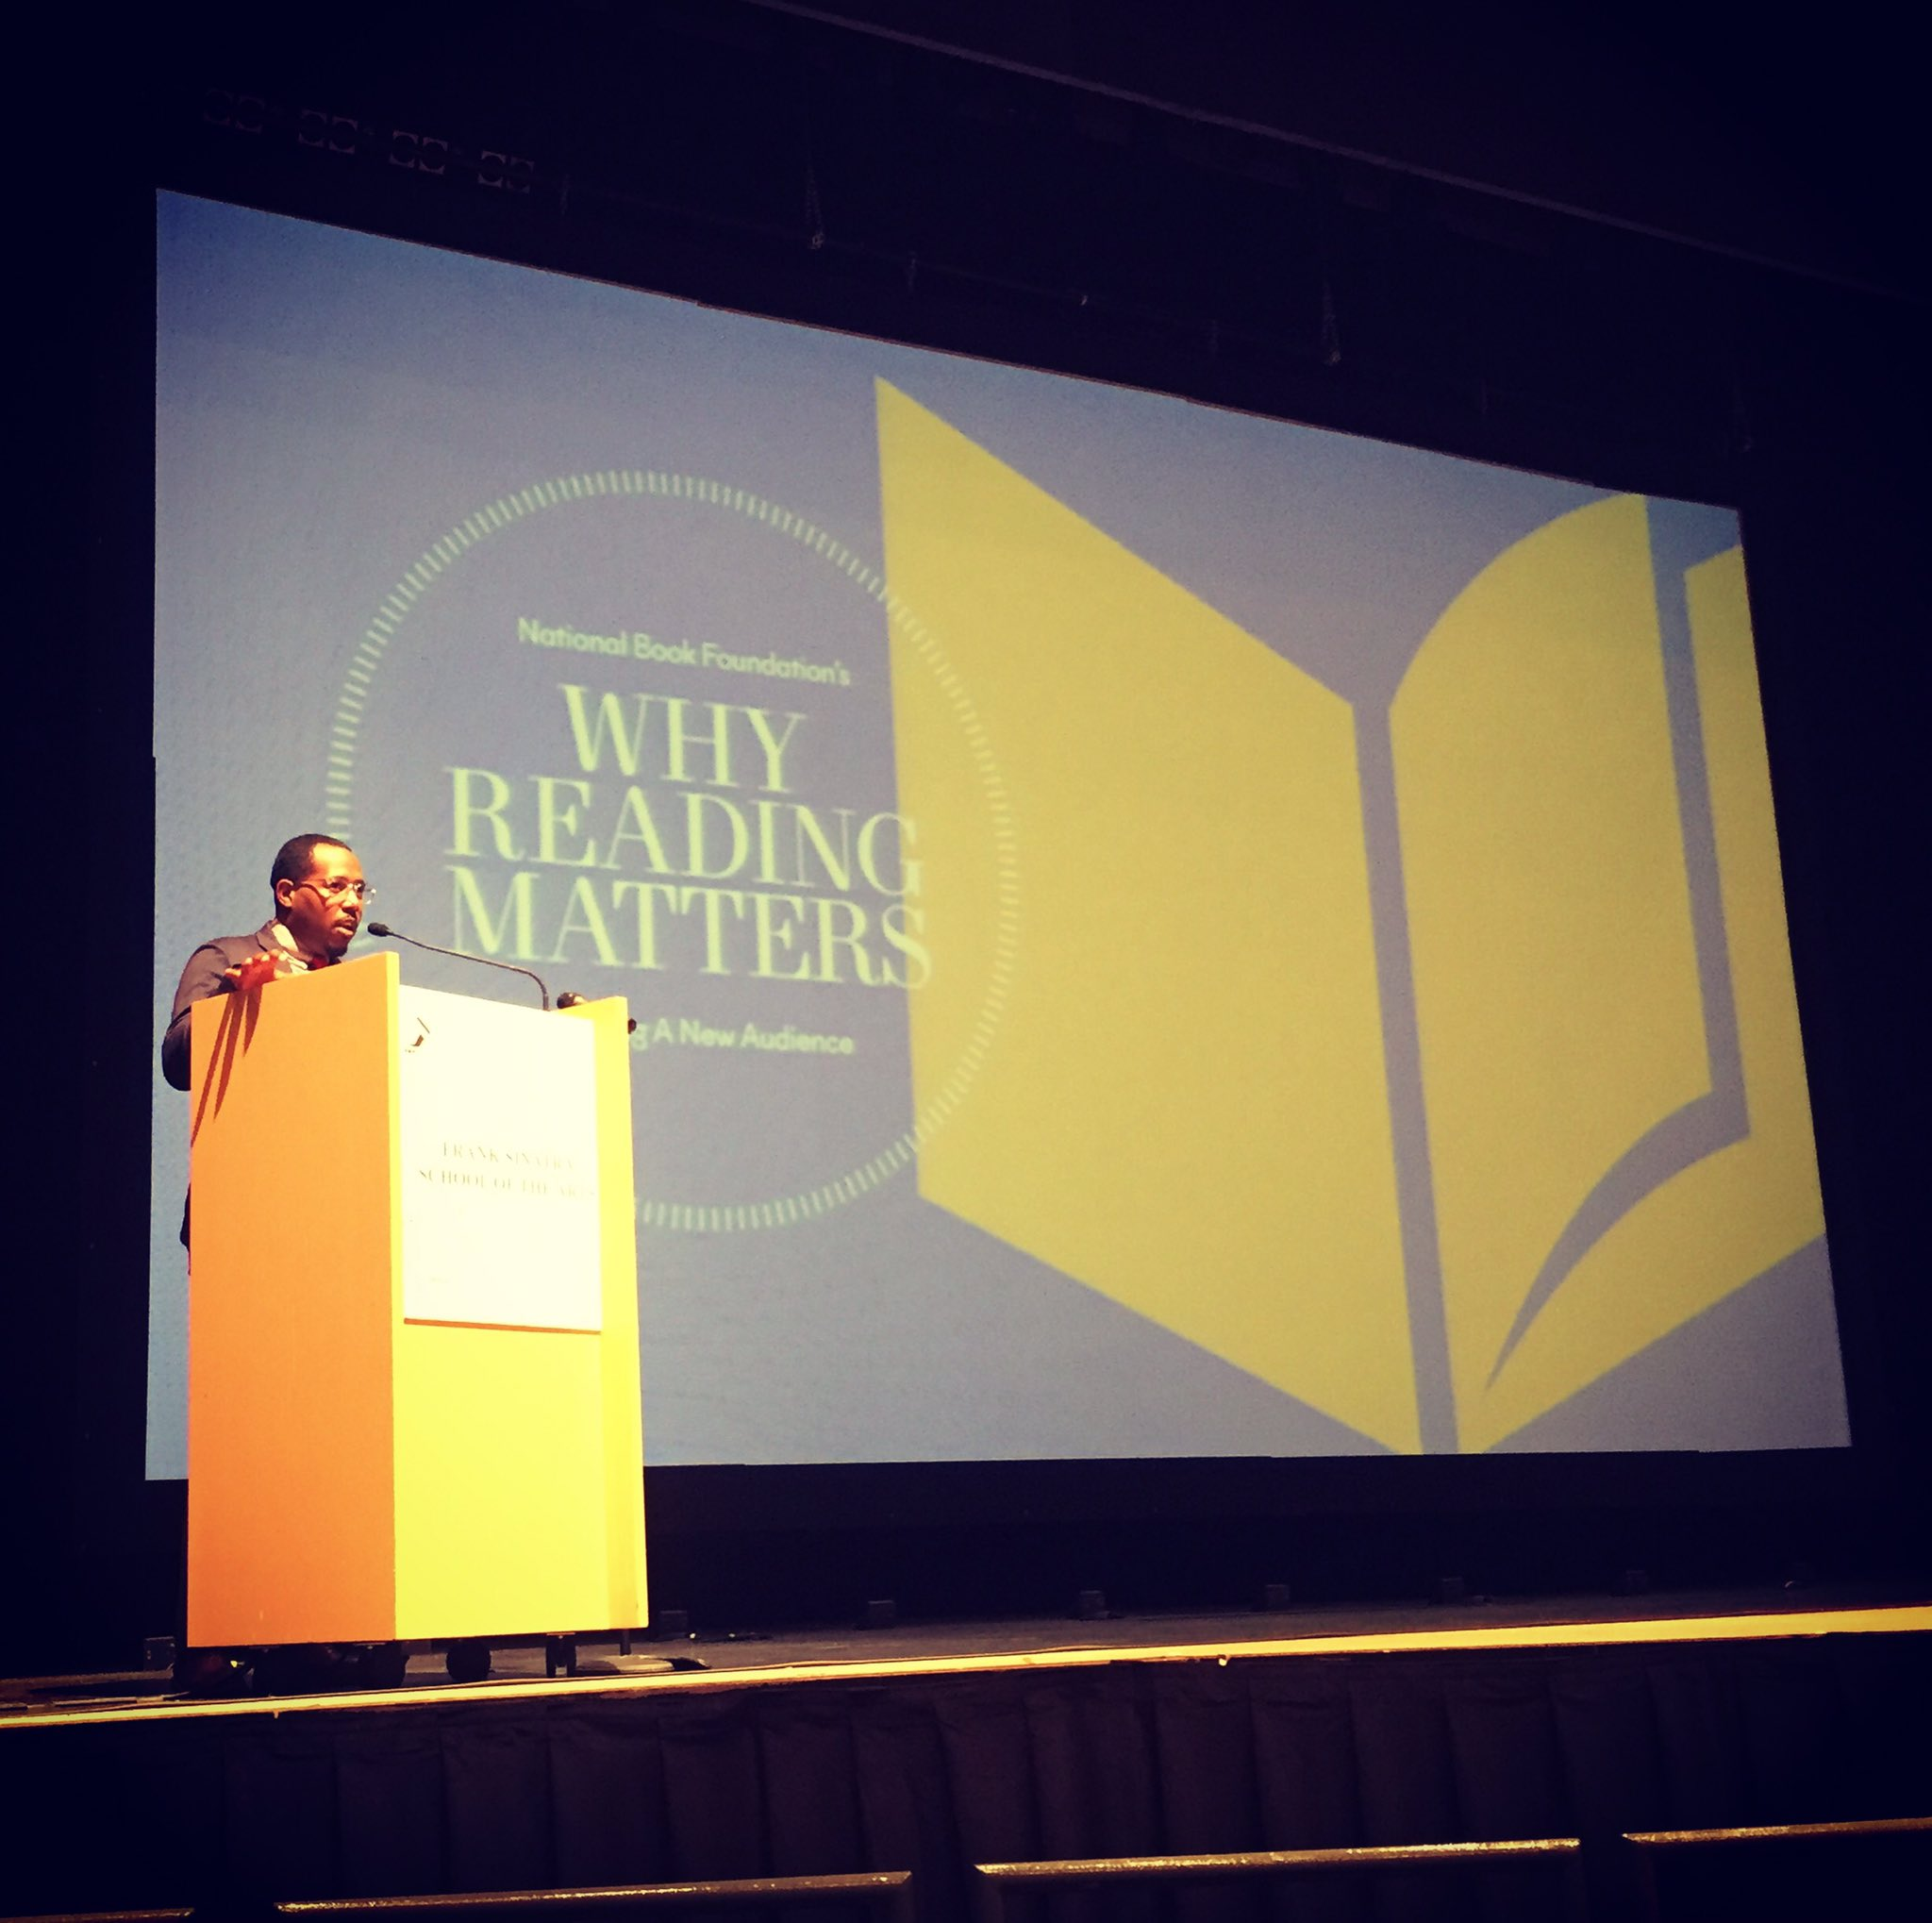 @AlvinIrby is speaking @nationalbook Why #ReadingMatters !!! # https://t.co/UDQkCYbniy